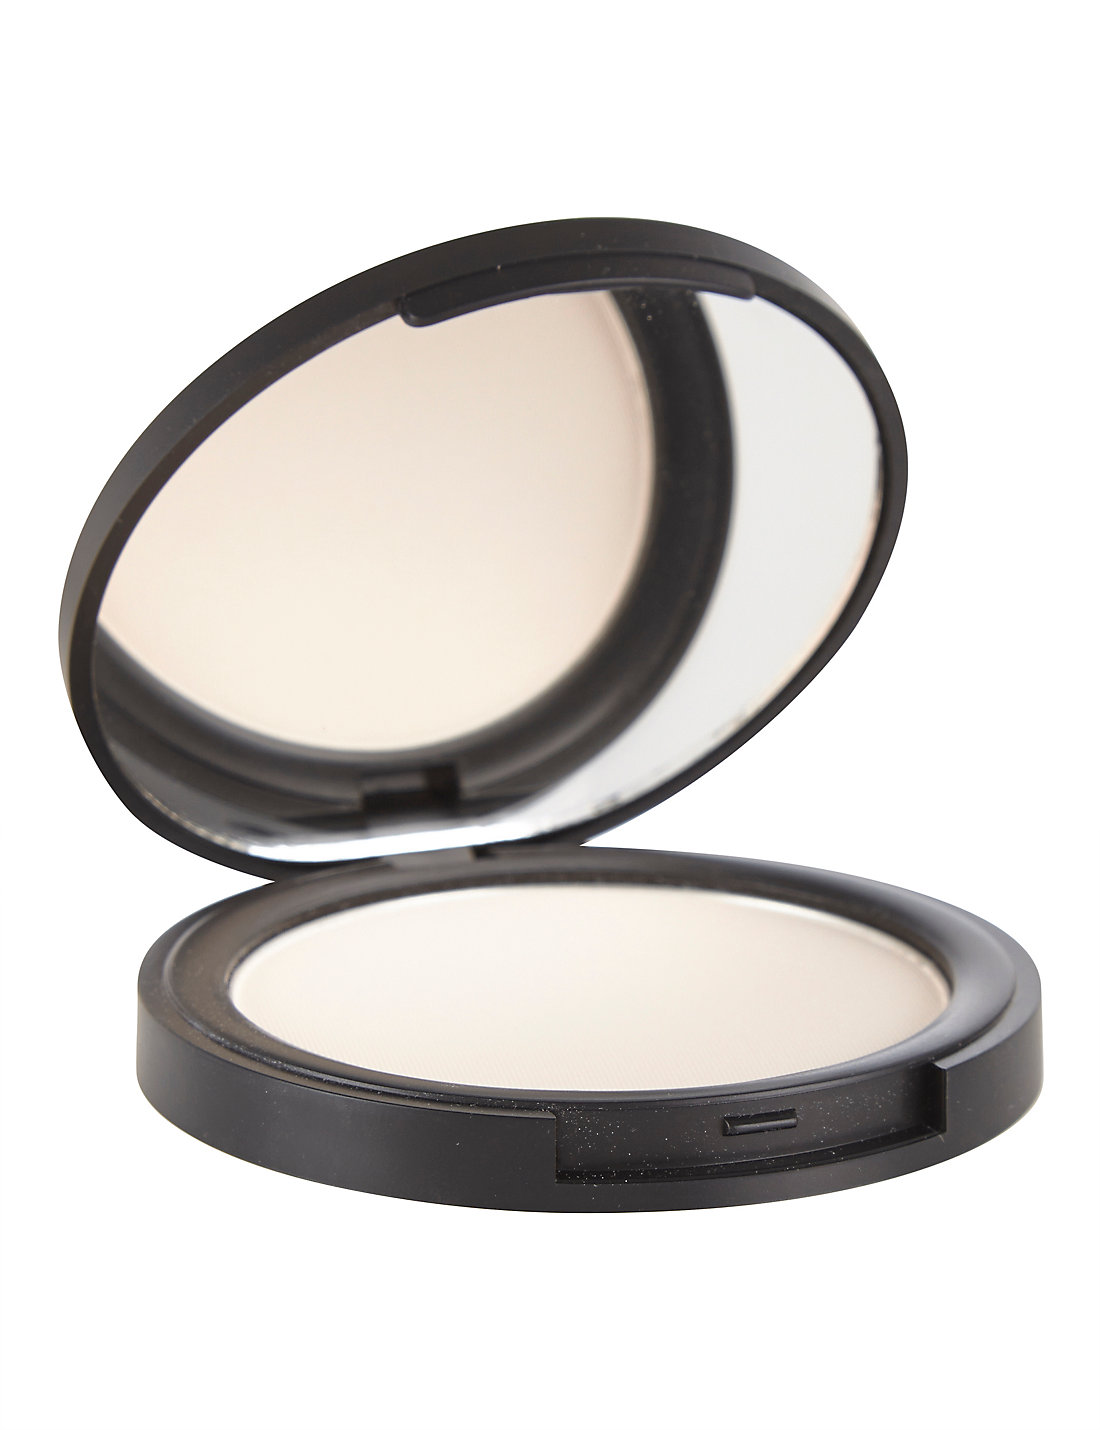 Velvet Mineral Powderset by Amazing Cosmetics #4